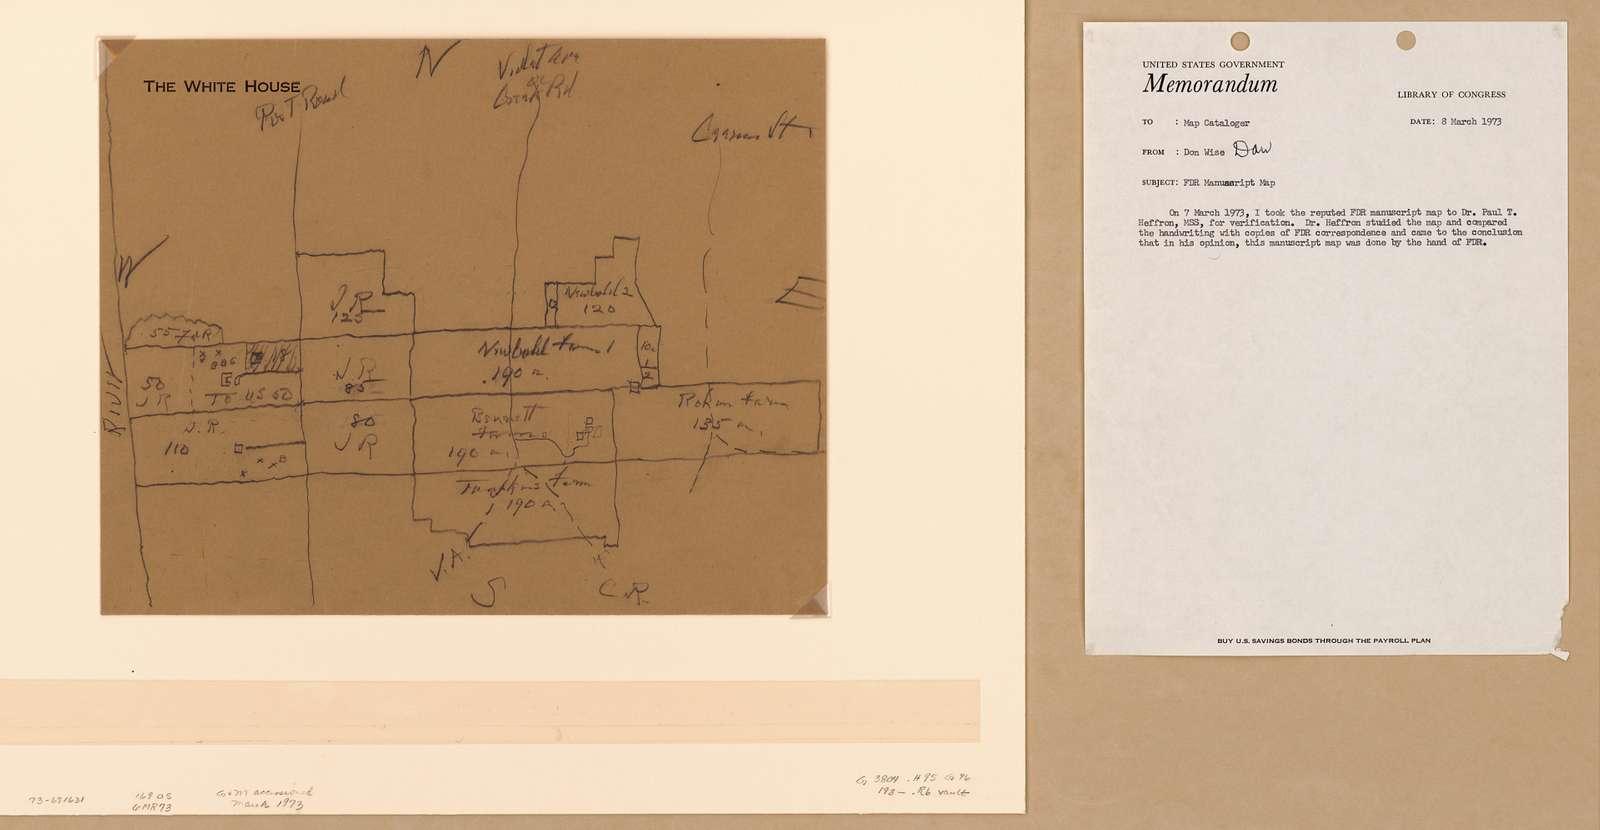 Map of Roosevelt properties at Hyde Park, N.Y